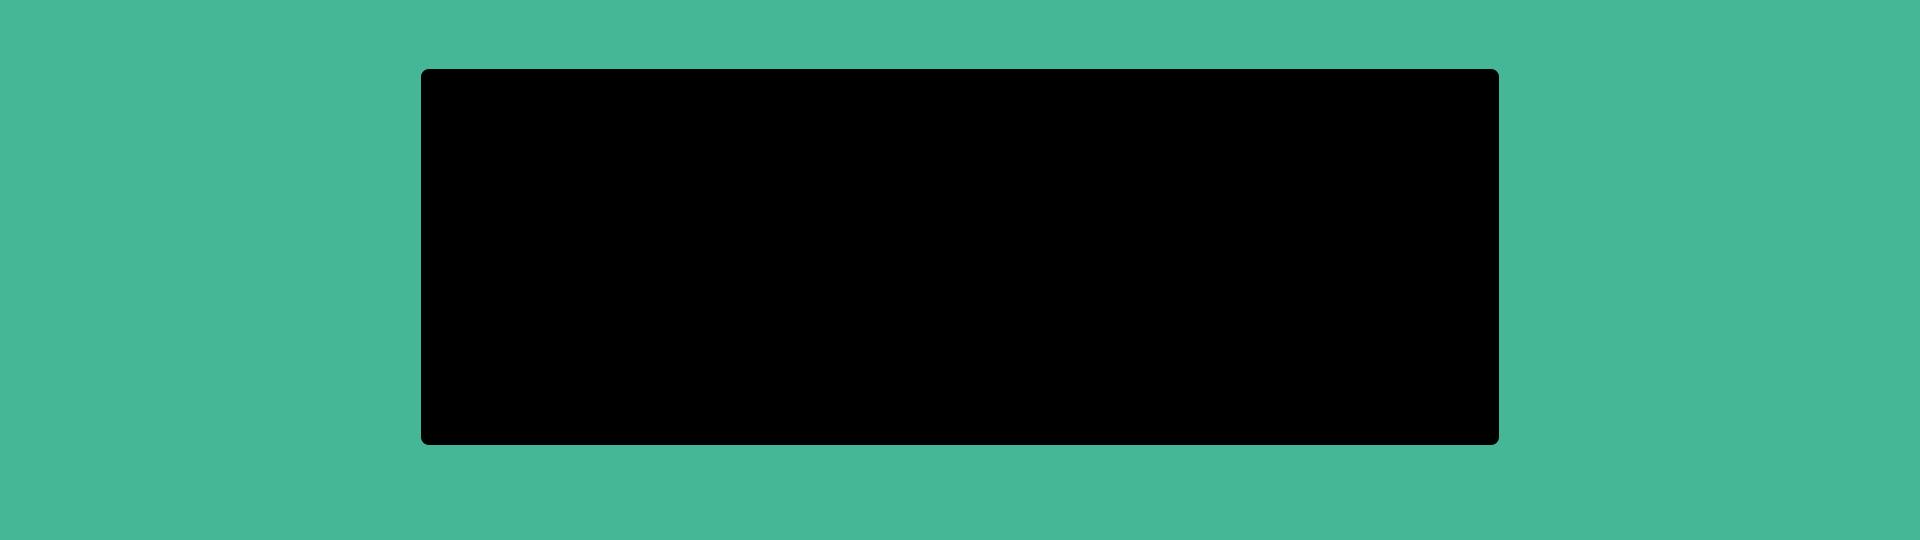 CATEGORY-OFKIR-HERYASAUYGUNSIRTCANTALARI30-01-10